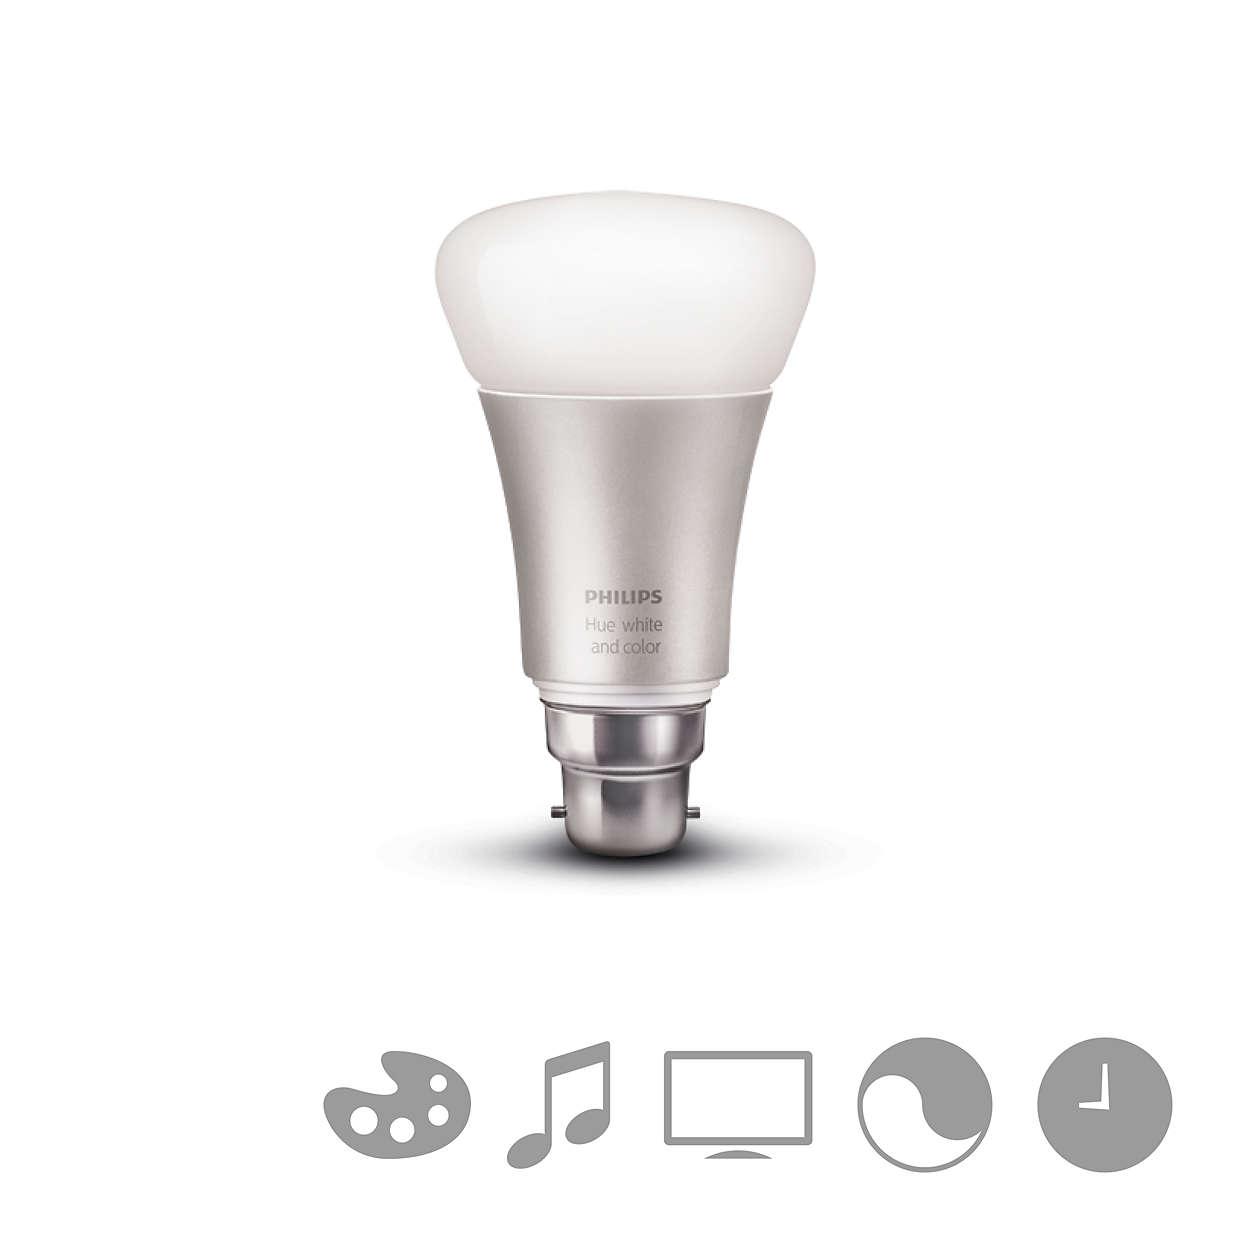 Personal Wireless Lighting 8718696440537